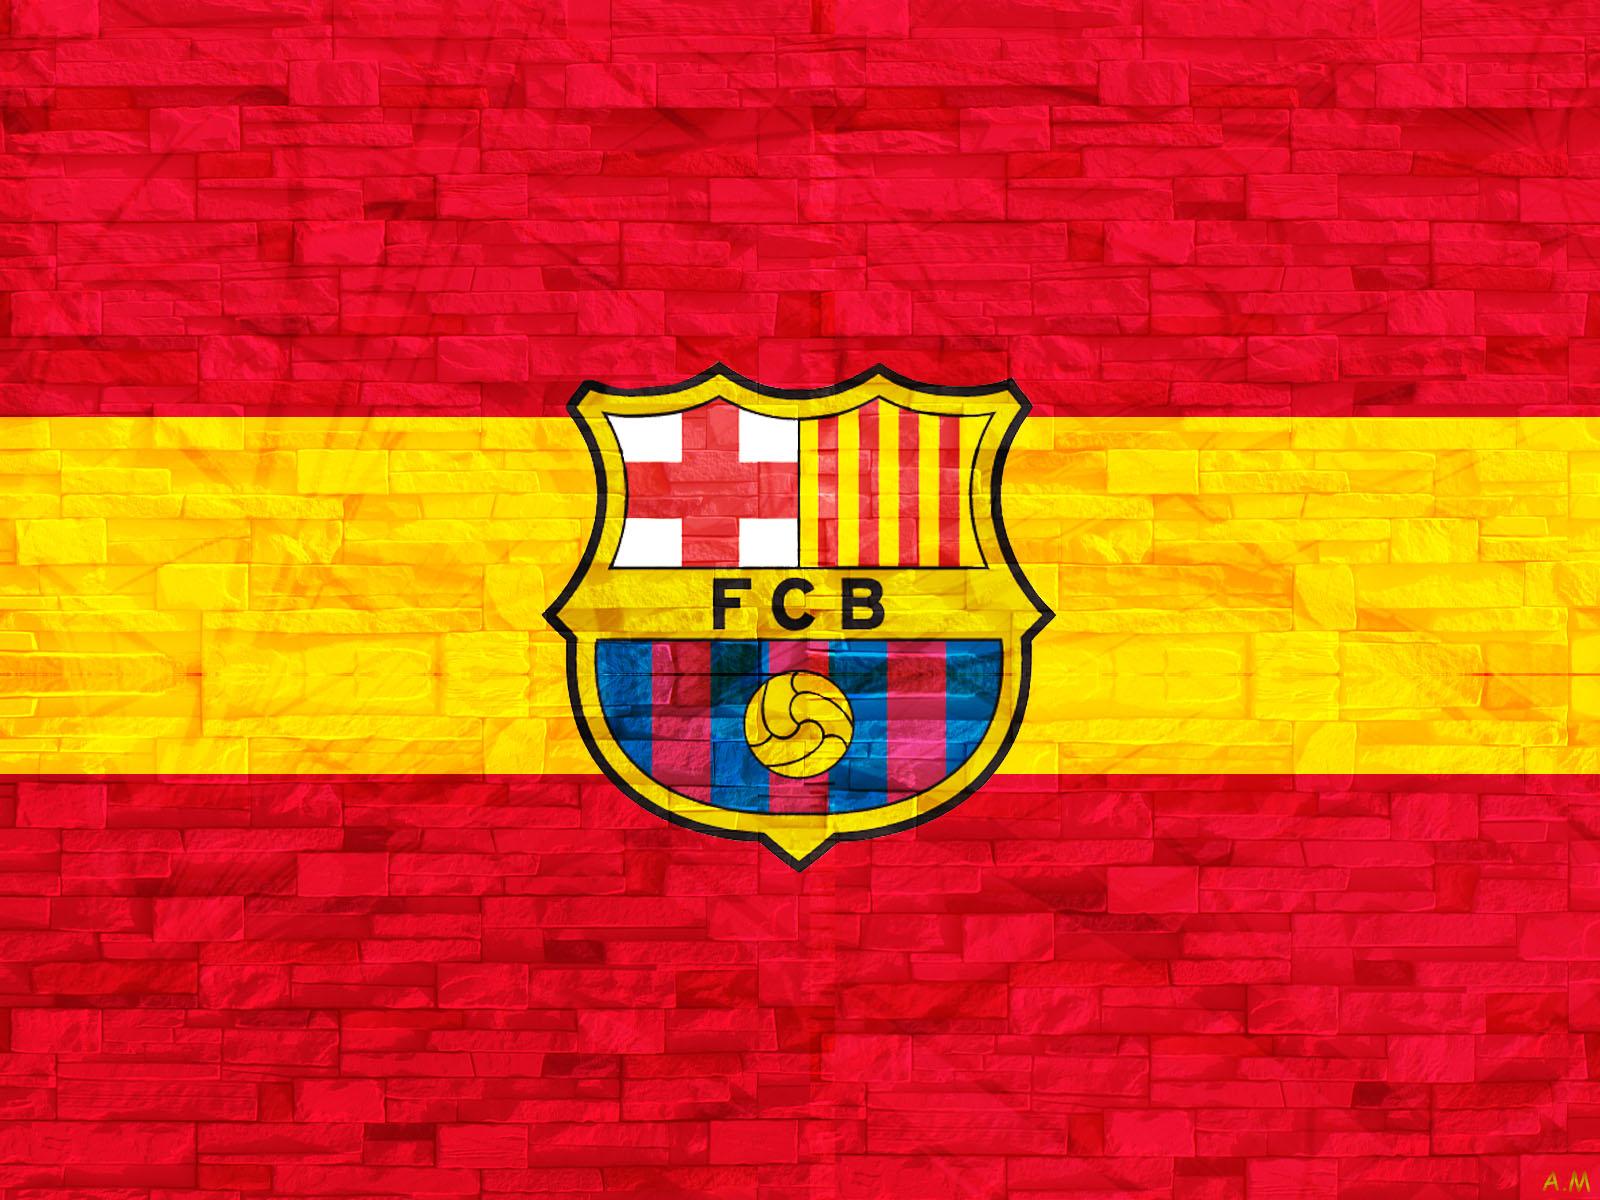 HD FC barcelona Wallpaper HD Wallpaper 1600x1200